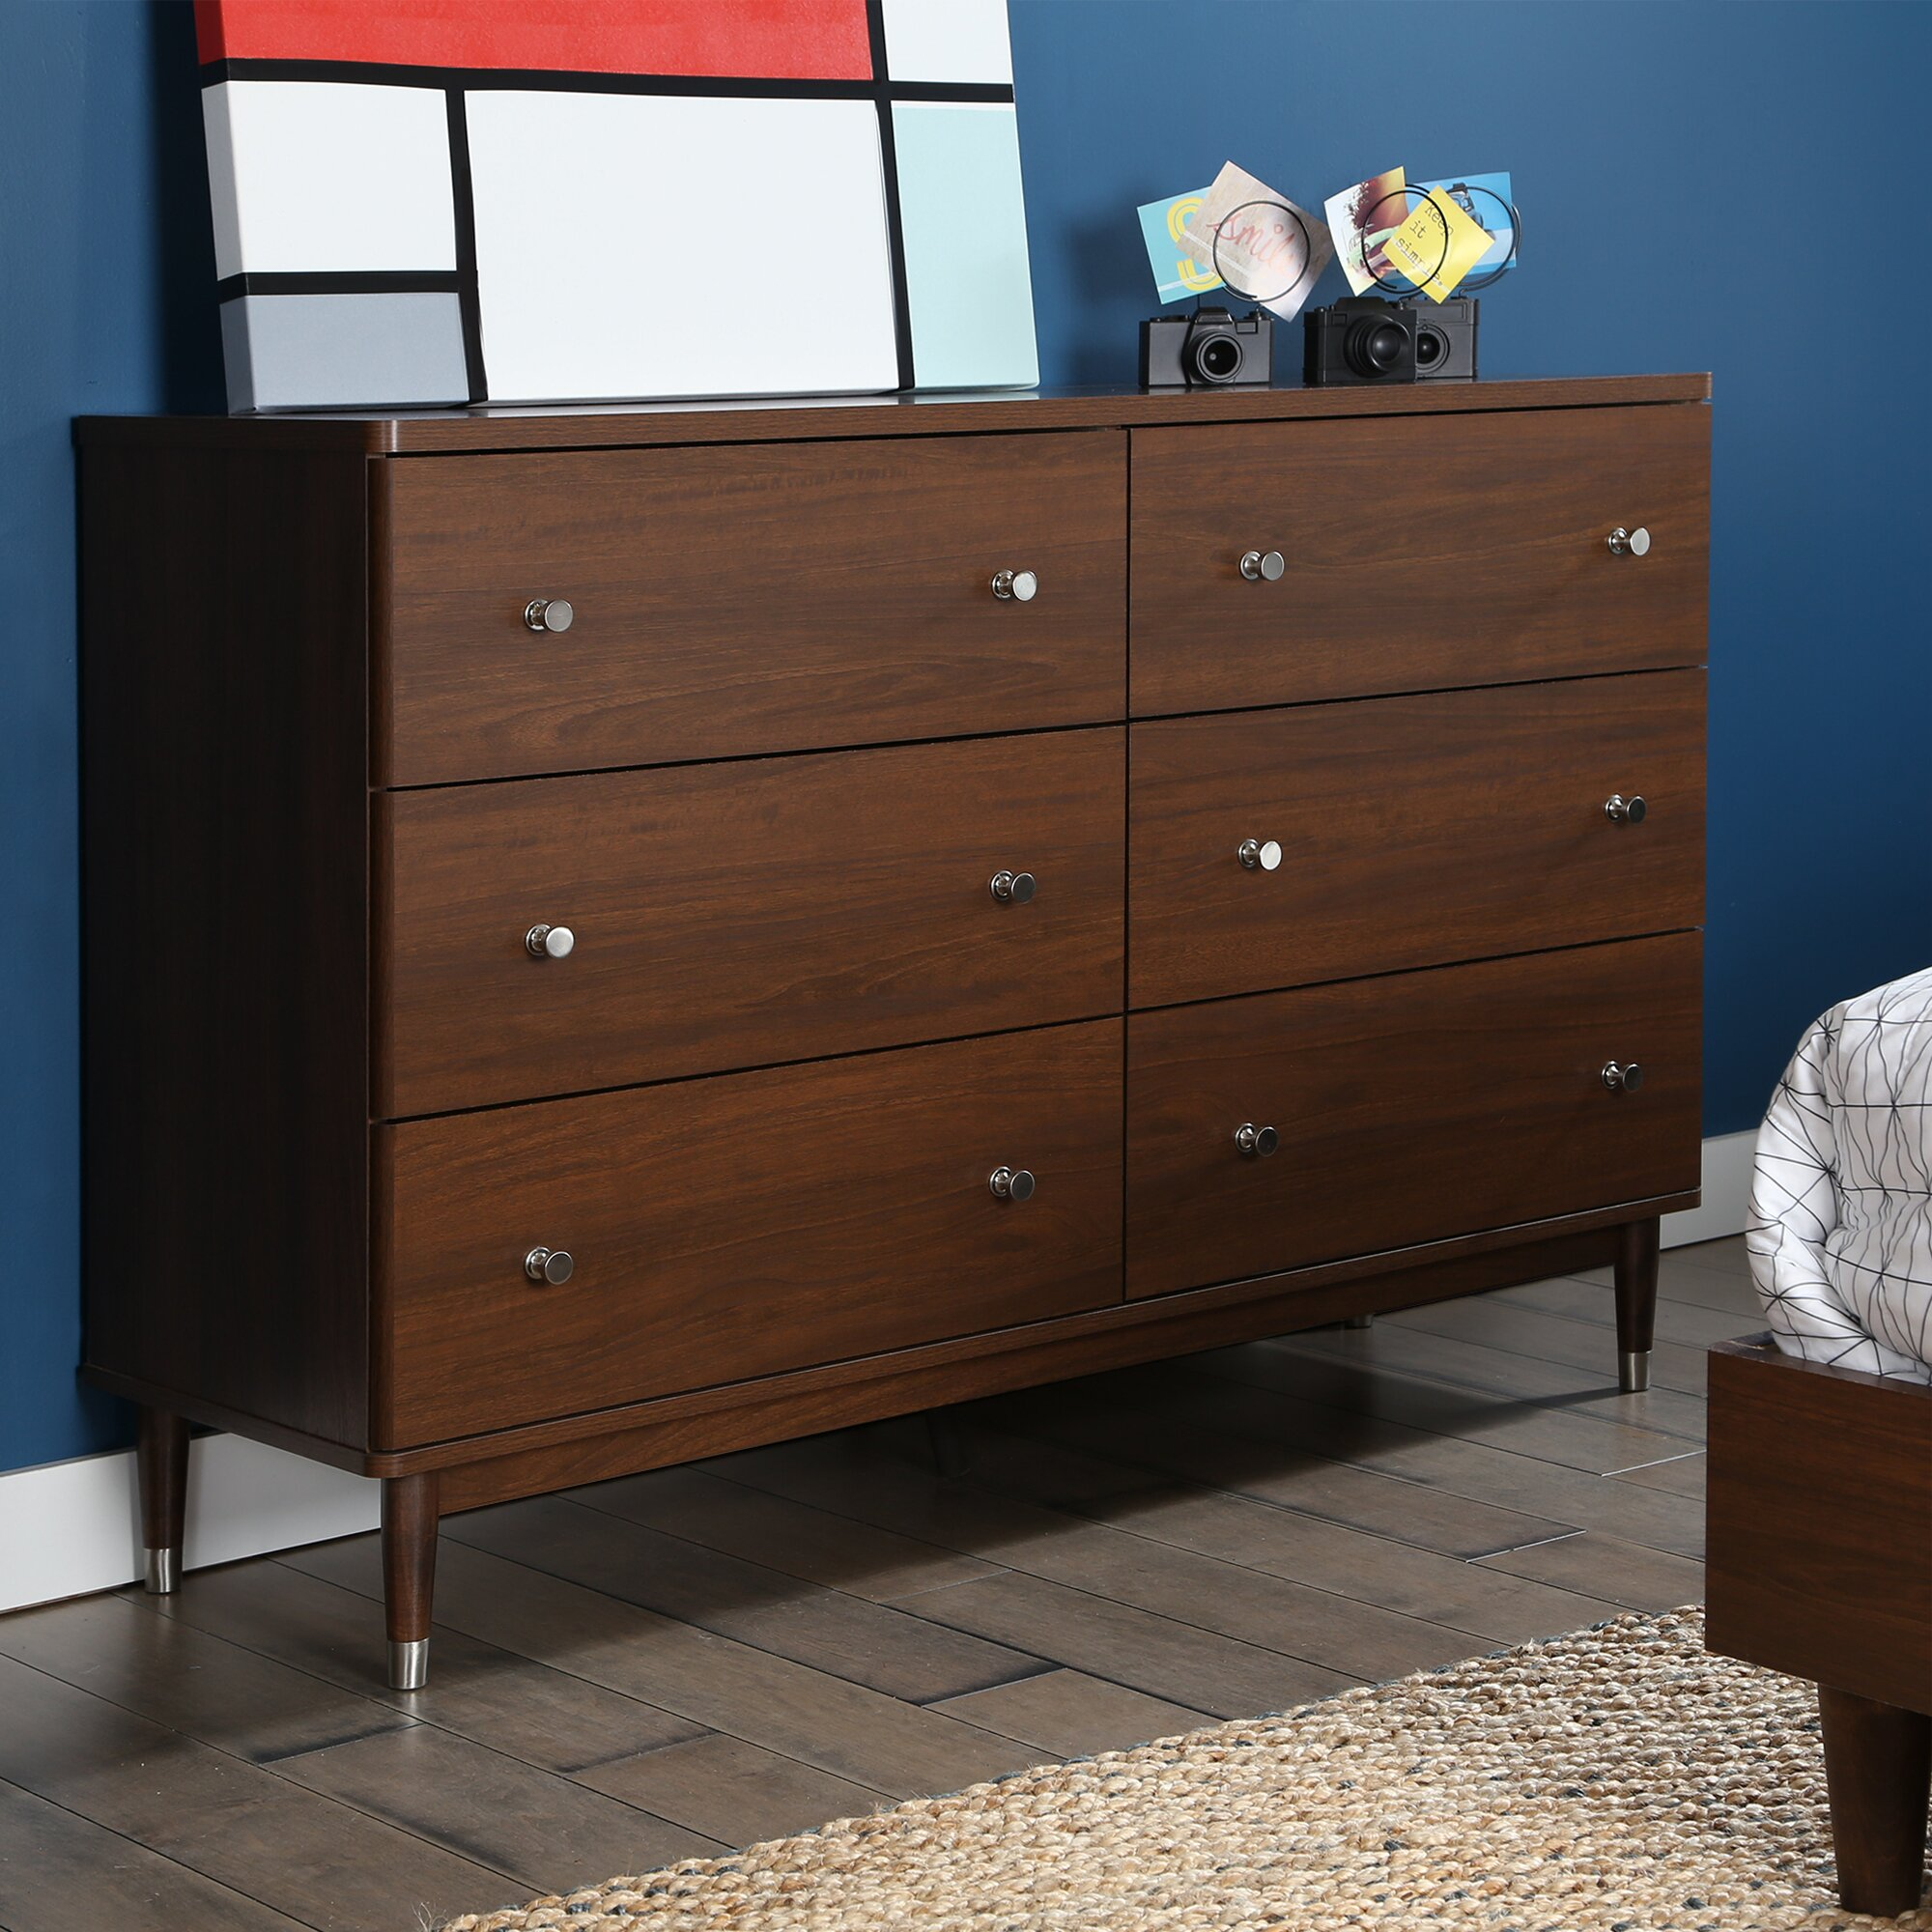 south shore olly mid century modern 6 drawer dresser reviews wayfair. Black Bedroom Furniture Sets. Home Design Ideas